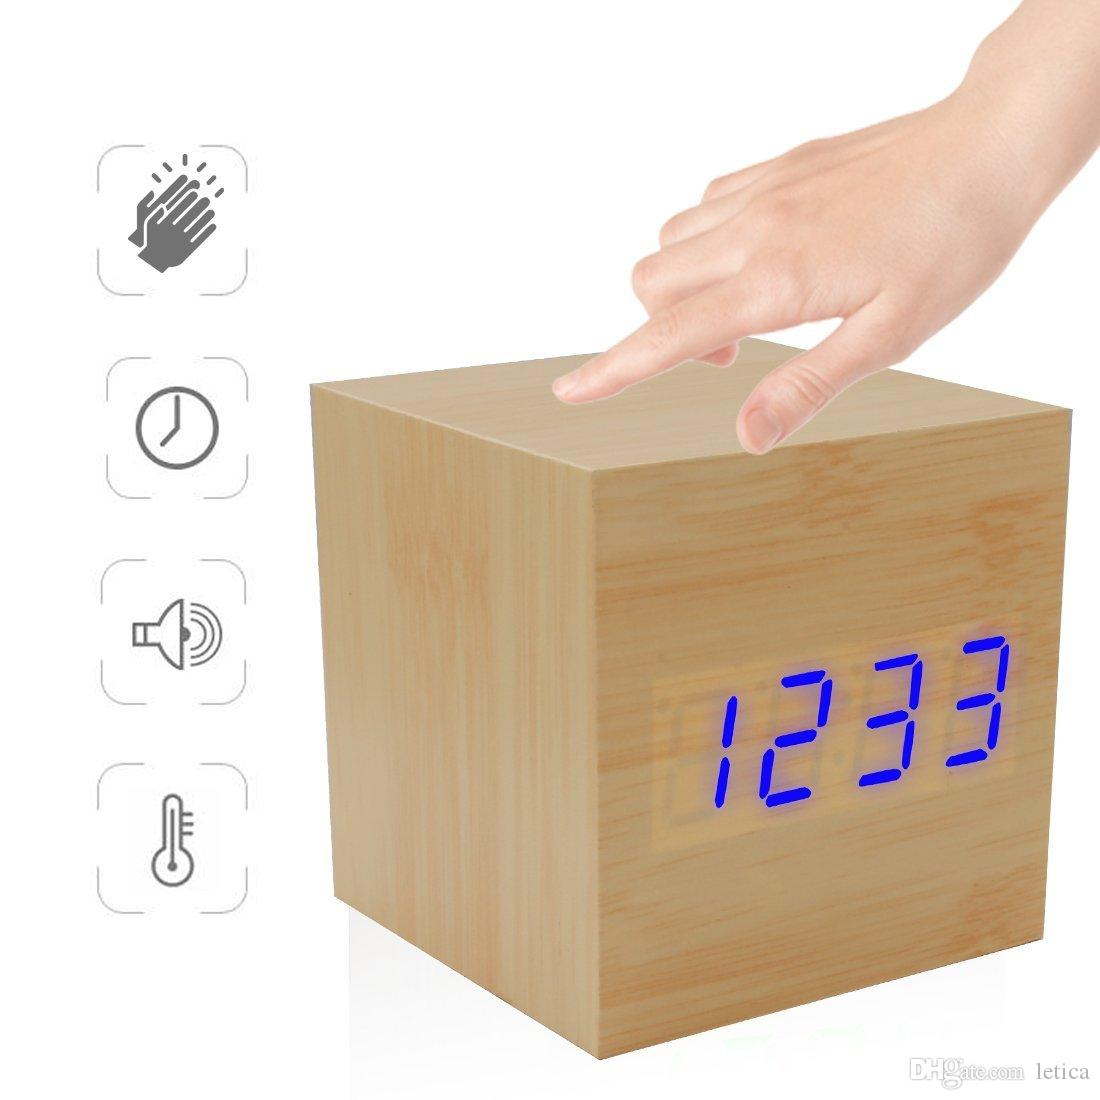 Uncategorized Wood Alarm Clock 2018 digital wooden alarm clock natural wood with led display three alarms function adjustable brightness temperature ti